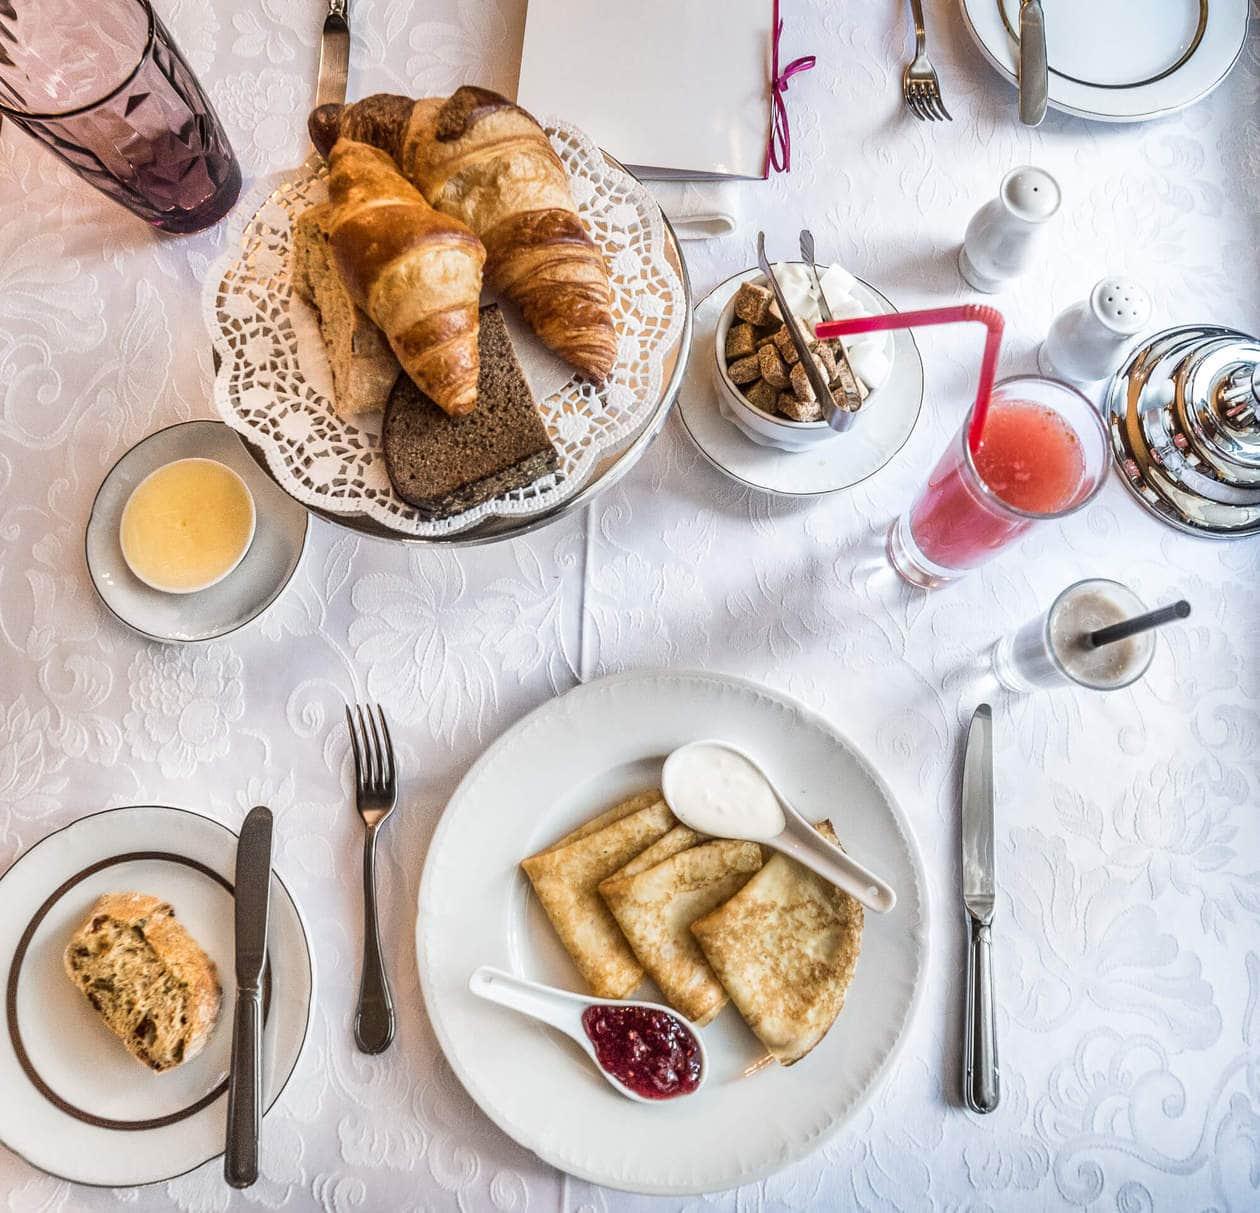 Hotel Breakfast at Gallery Park Hotel and Spa in Riga, Latvia